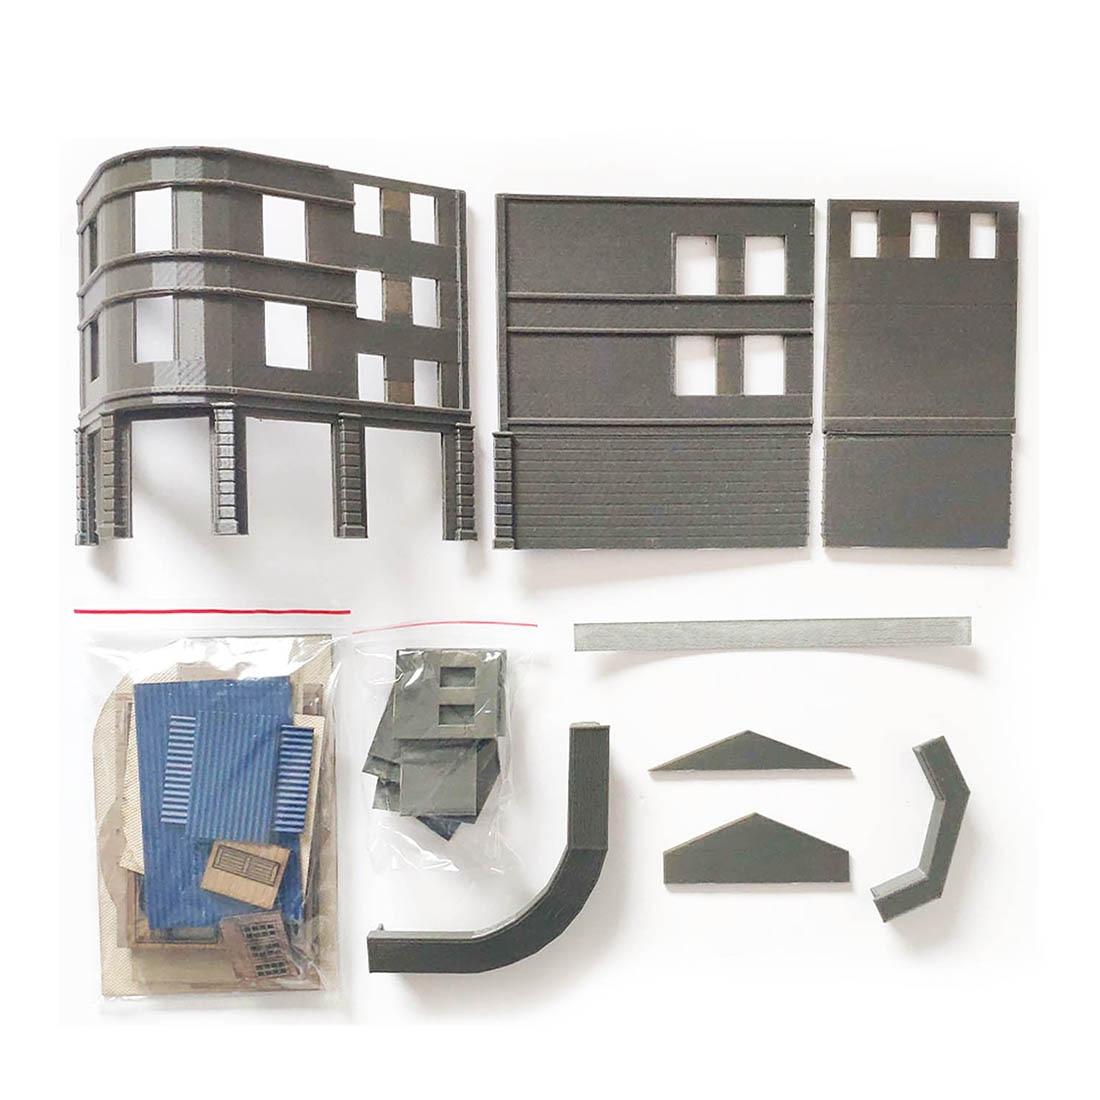 16.5x13.5x9 cm Zand Tafel Railway Trein Scene Hoek Kruidenier Montage Model Building Kit (Geen Cijfers auto's en Andere Gebouwen)